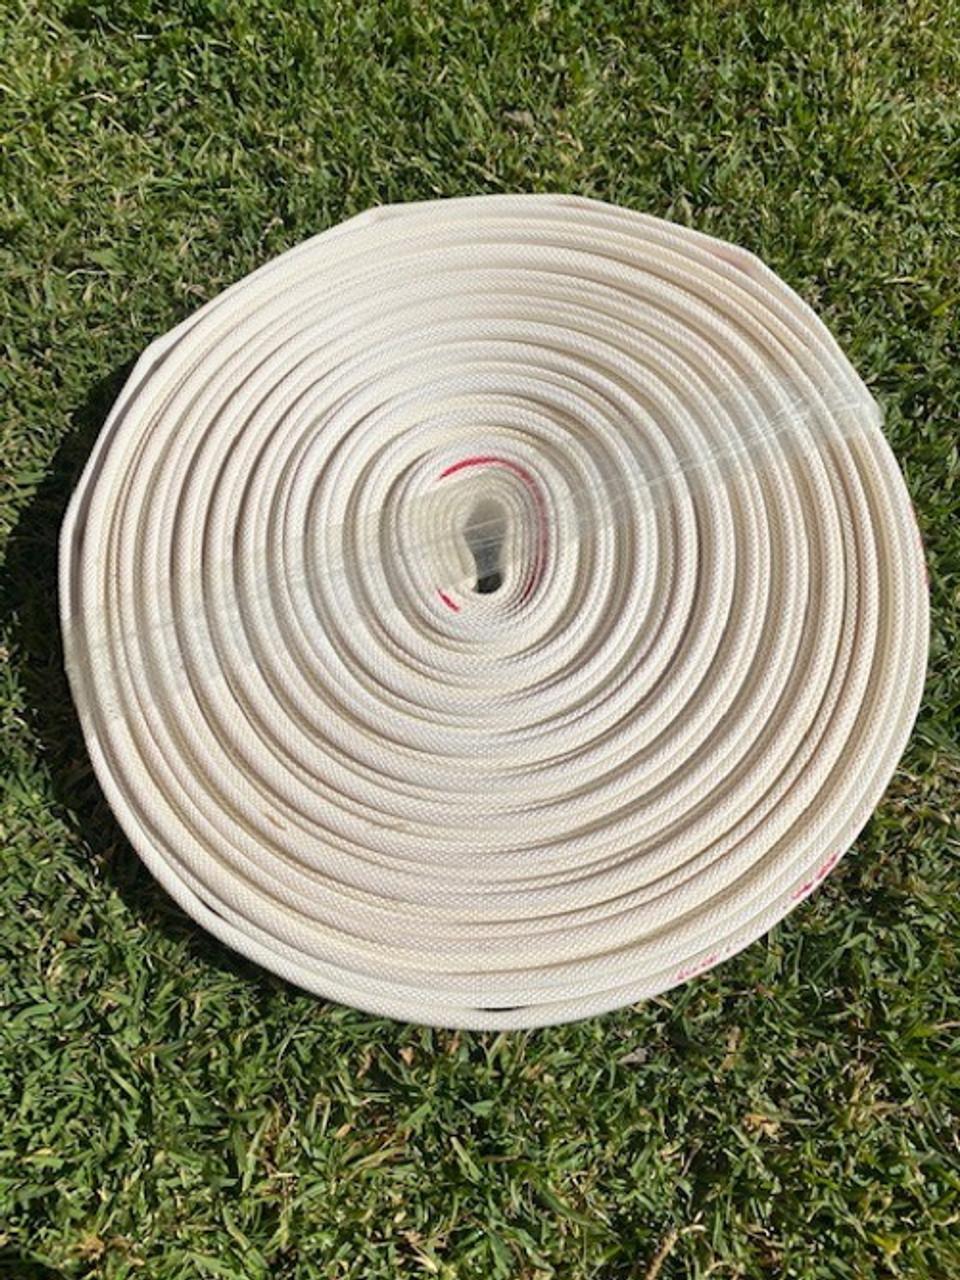 25mm Percolating fire hose